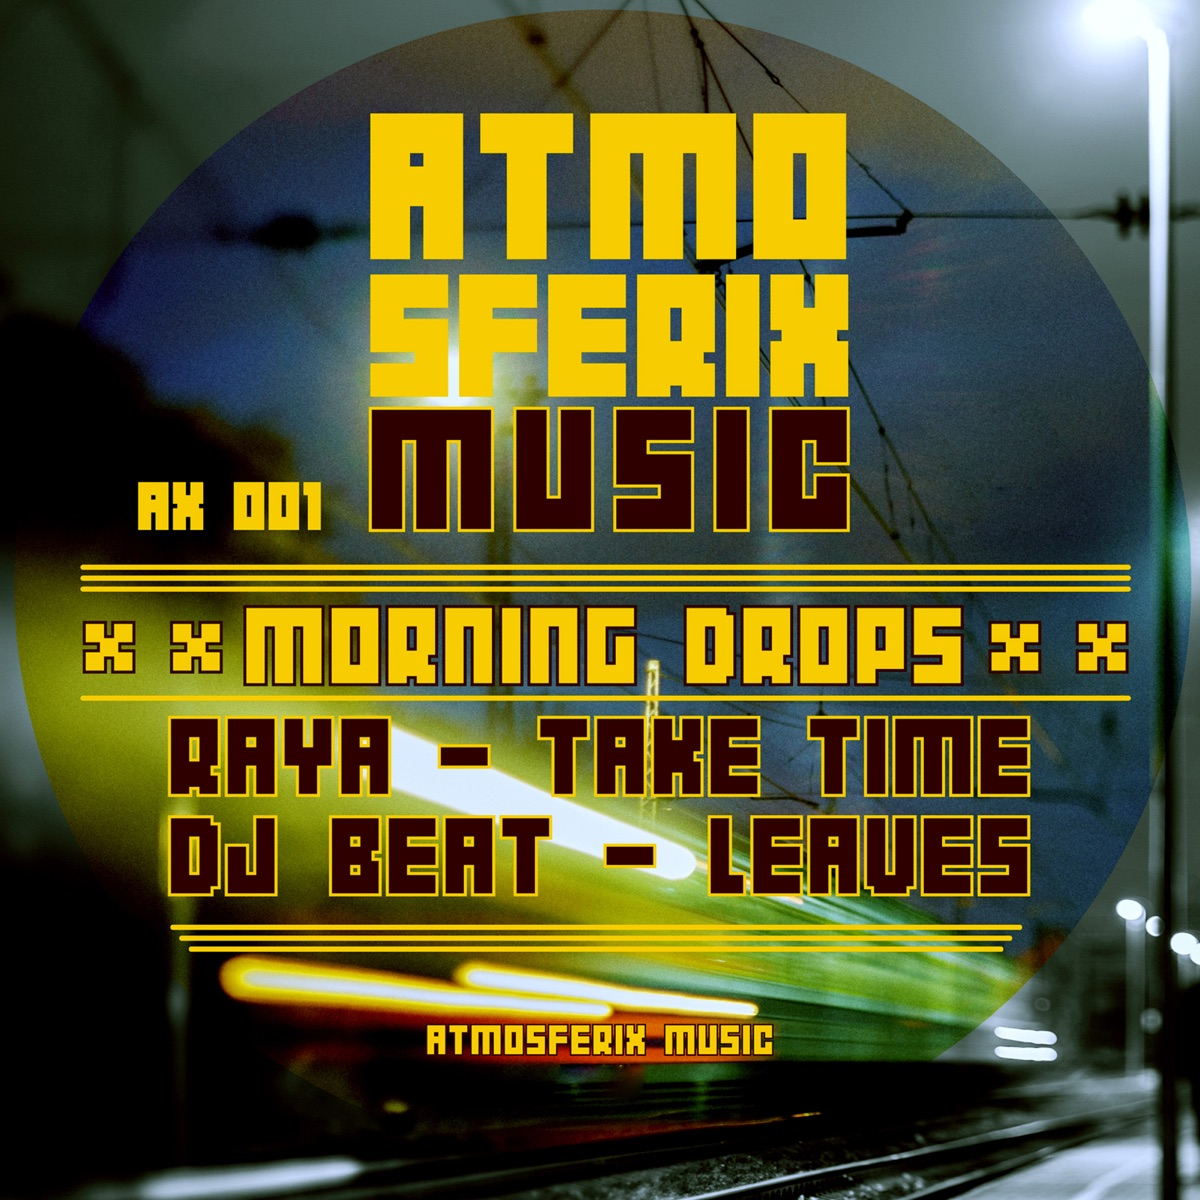 Morning Drops - Single Raya  DJ Beat CD cover